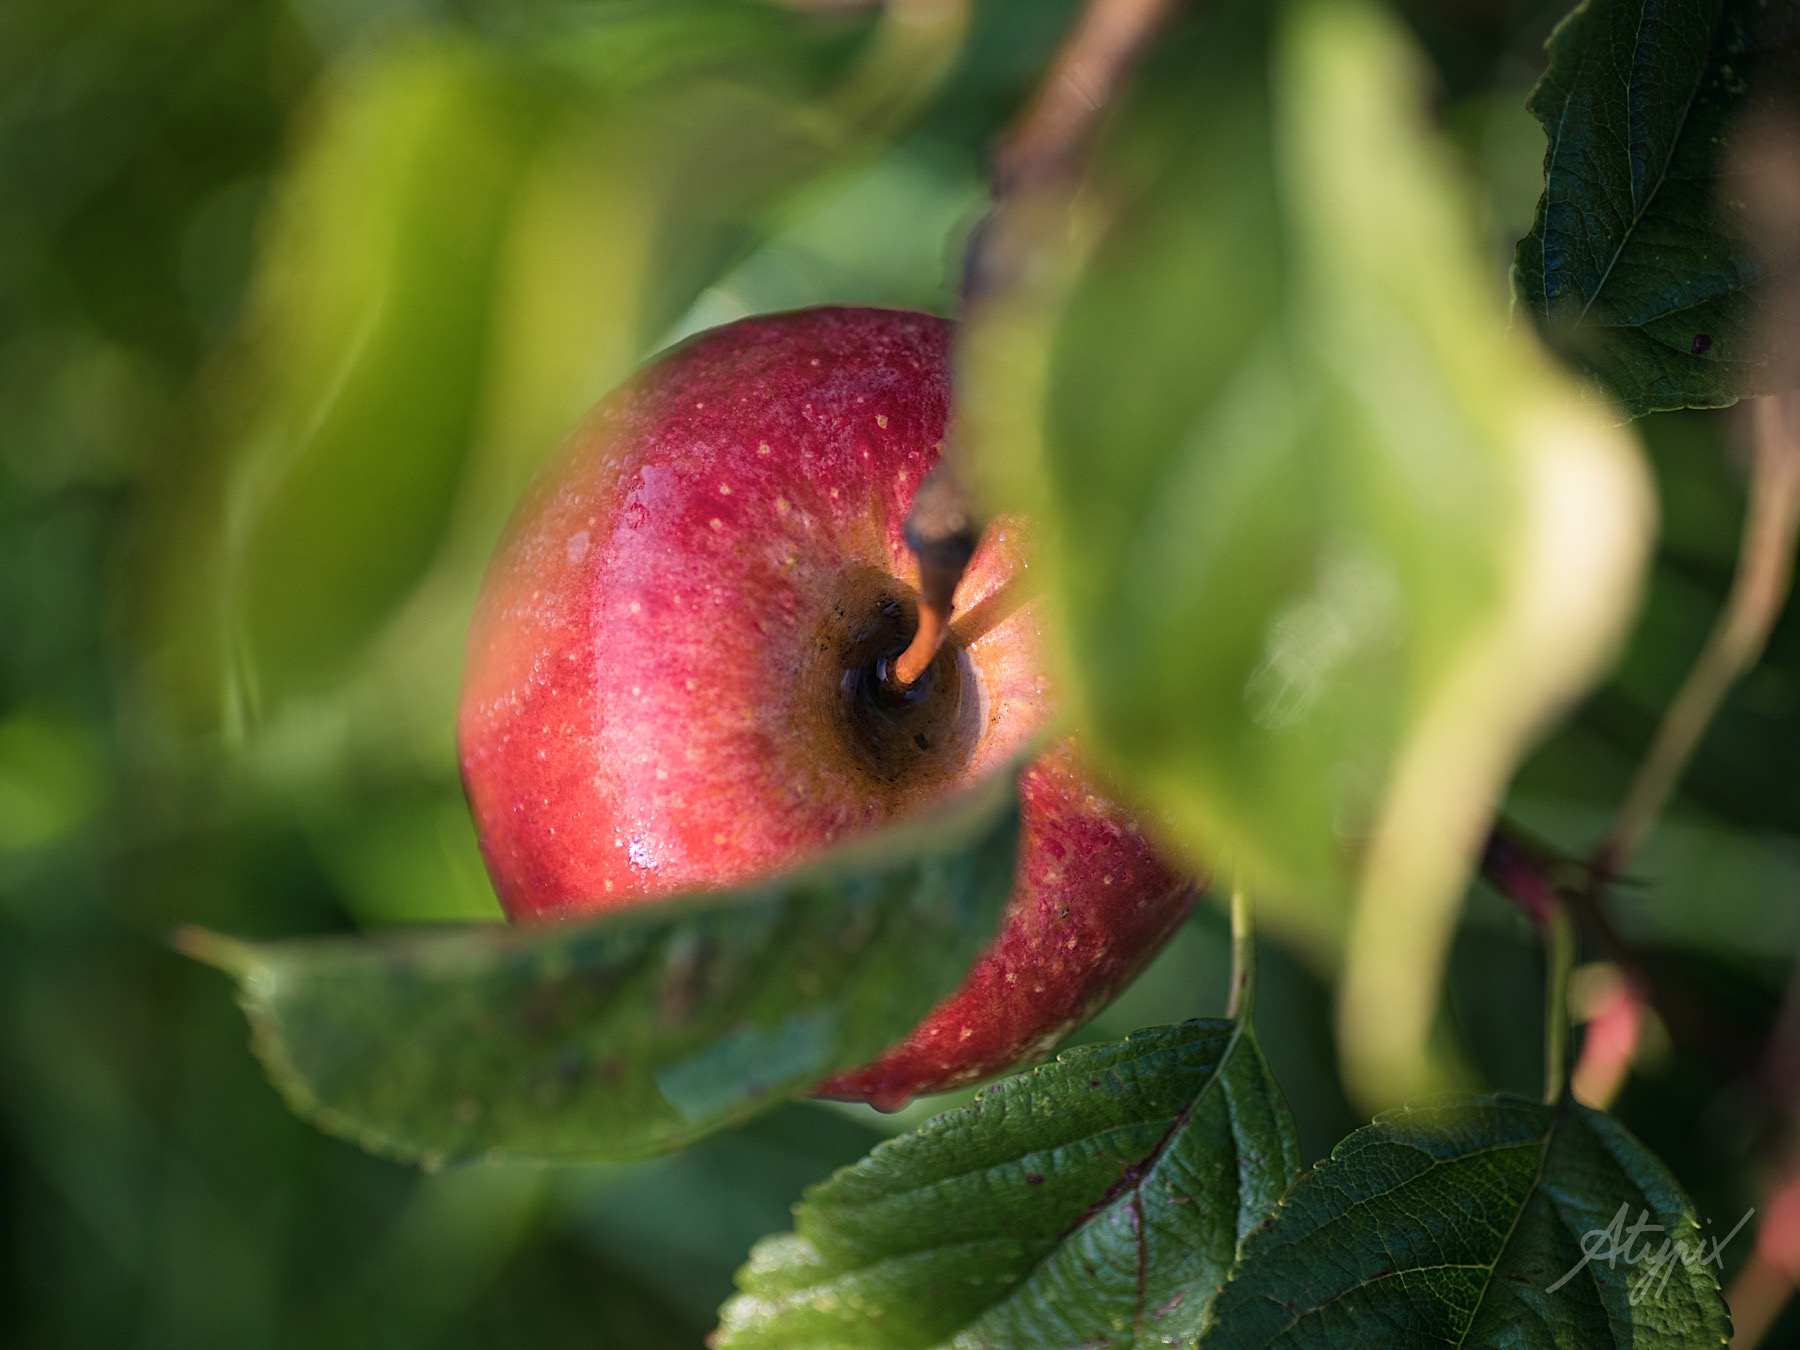 photo-reportage agriculture biologiques pommes